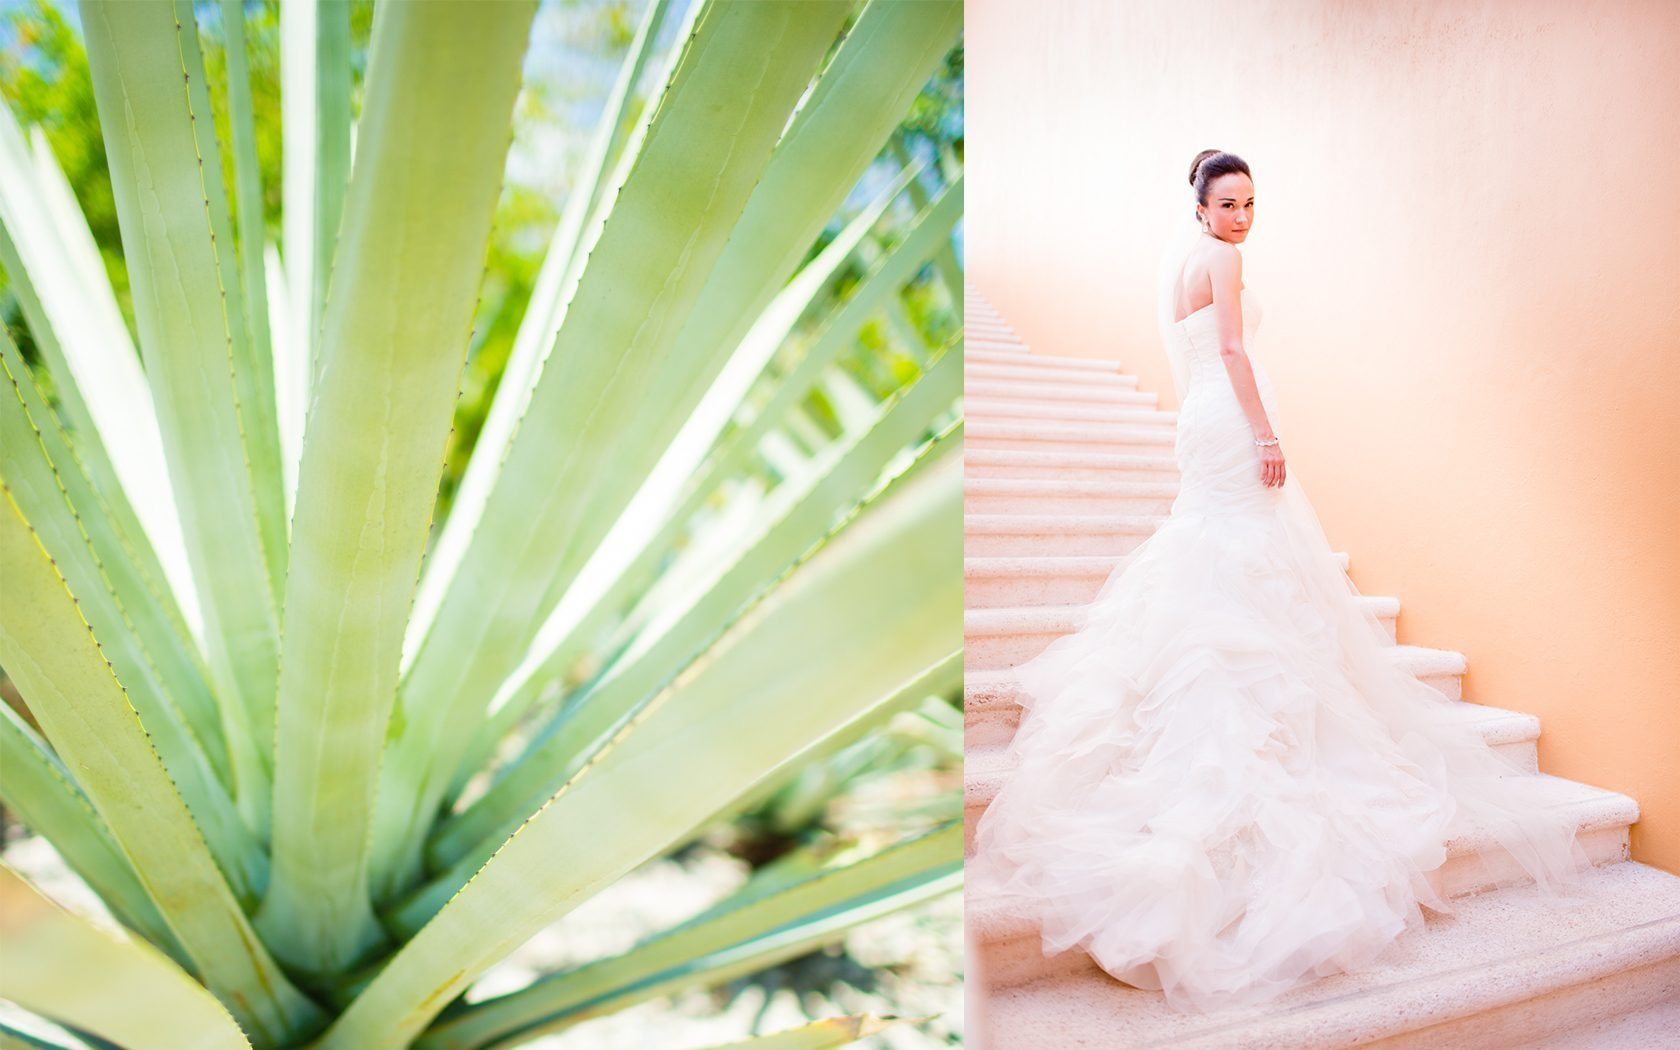 Fairmont_Mayakoba_Wedding_008-1680x1050.jpg